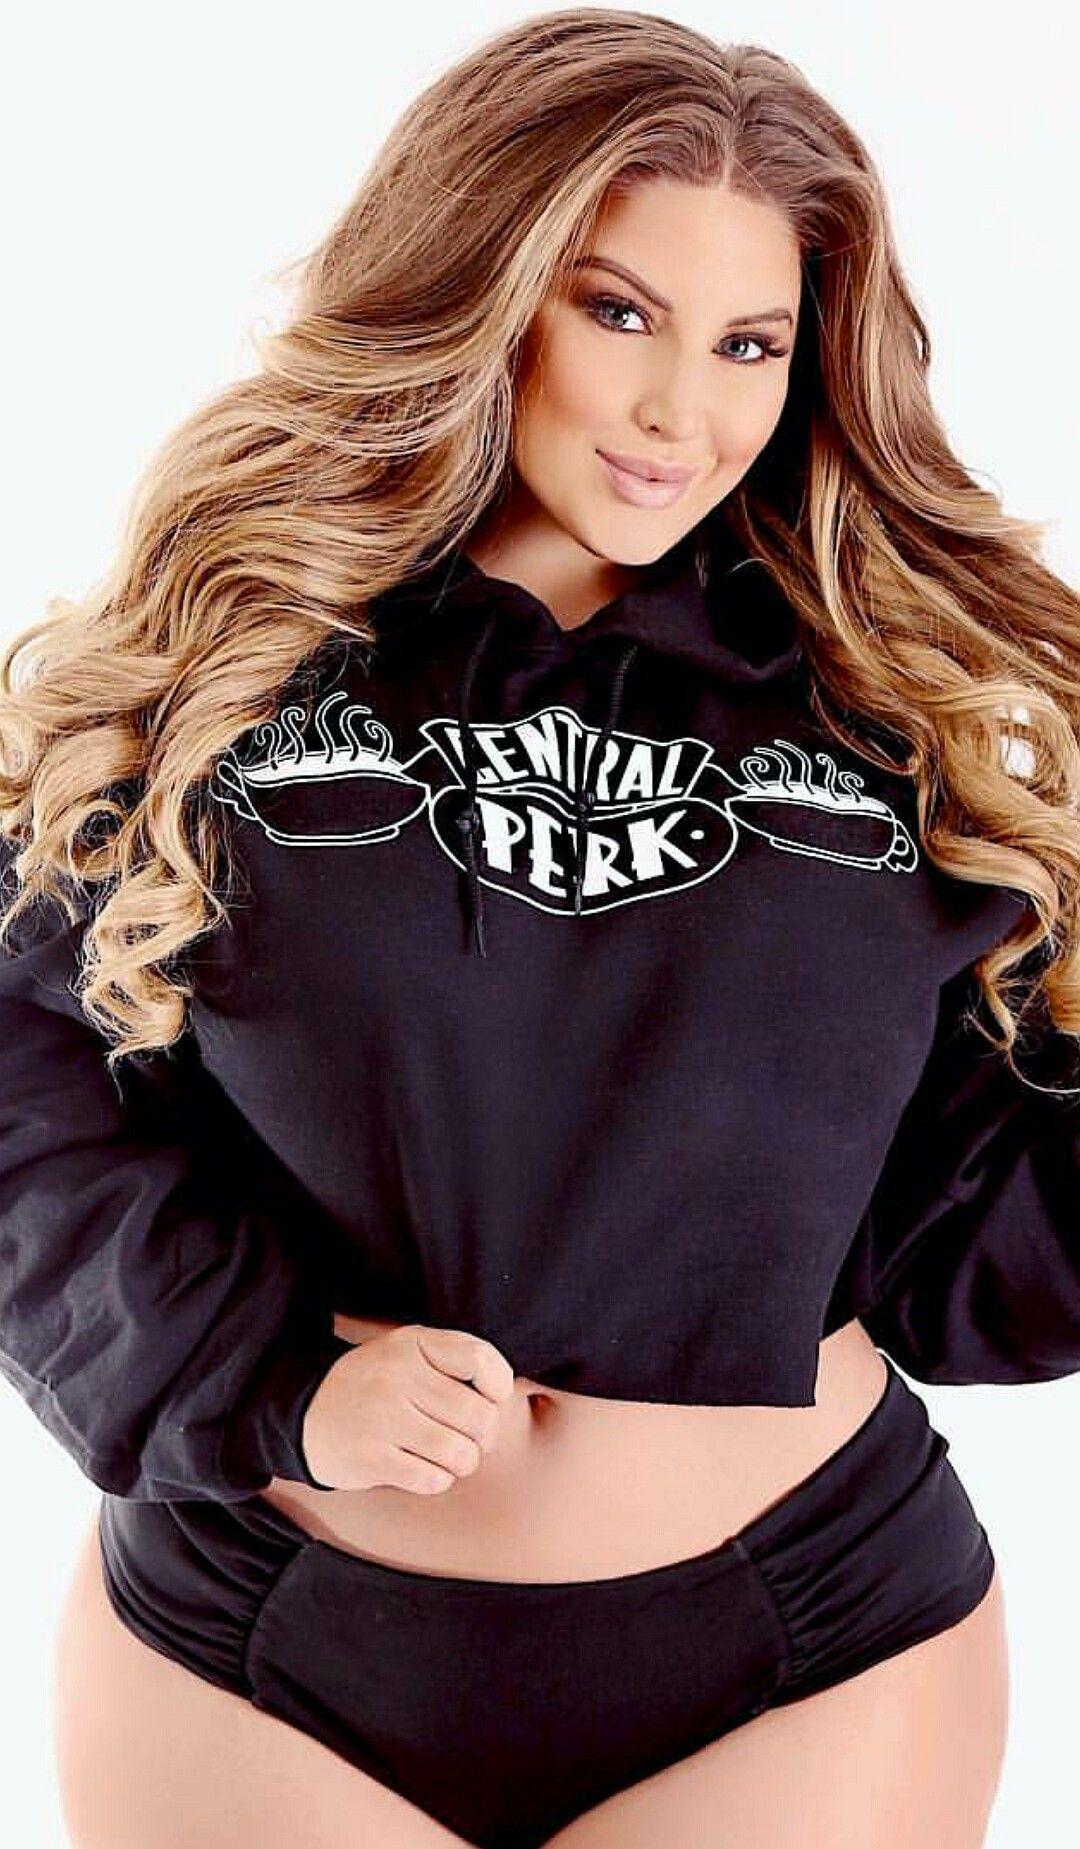 Ashley Alexiss Ashley Alexiss In 2019 Beautiful Curves